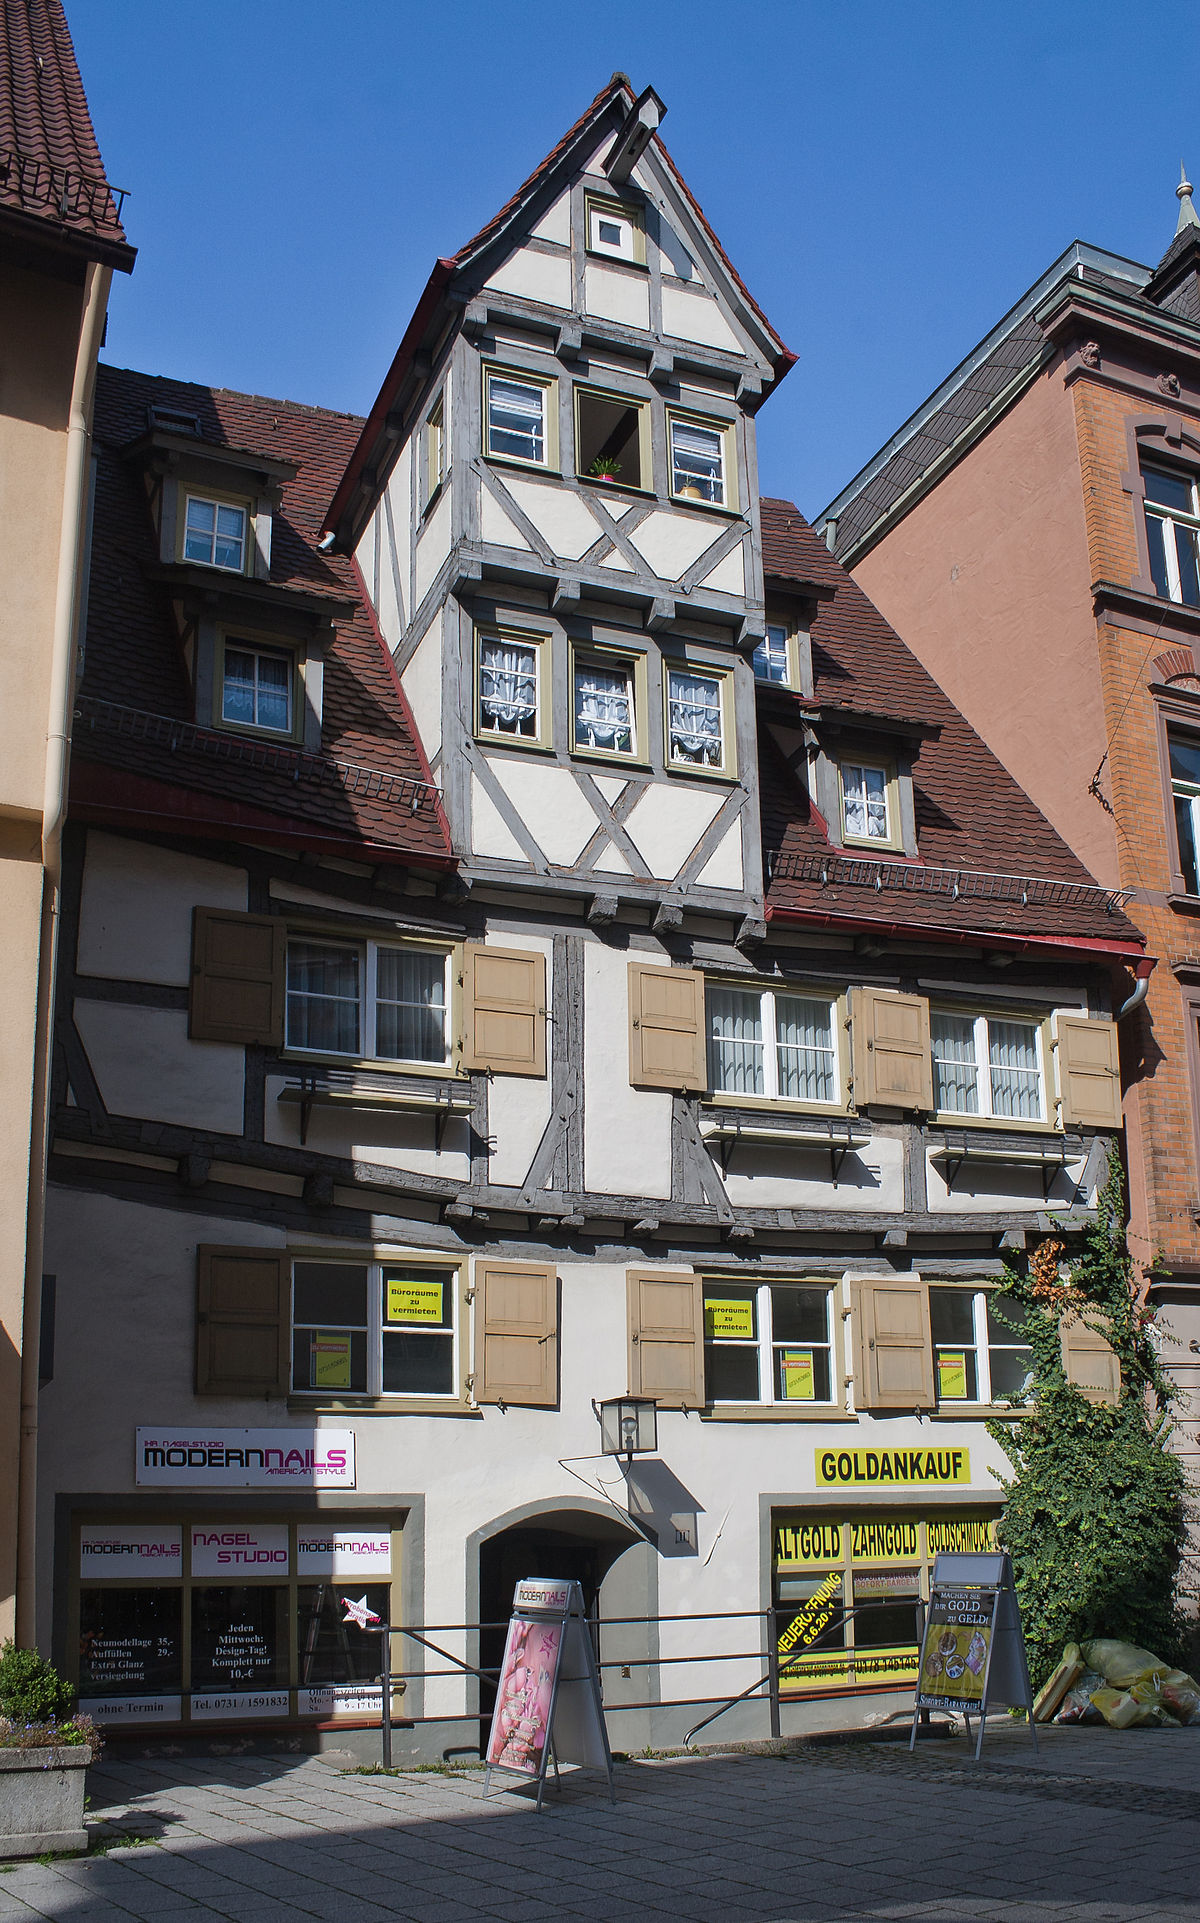 zwerchhaus  u2013 wiktionary